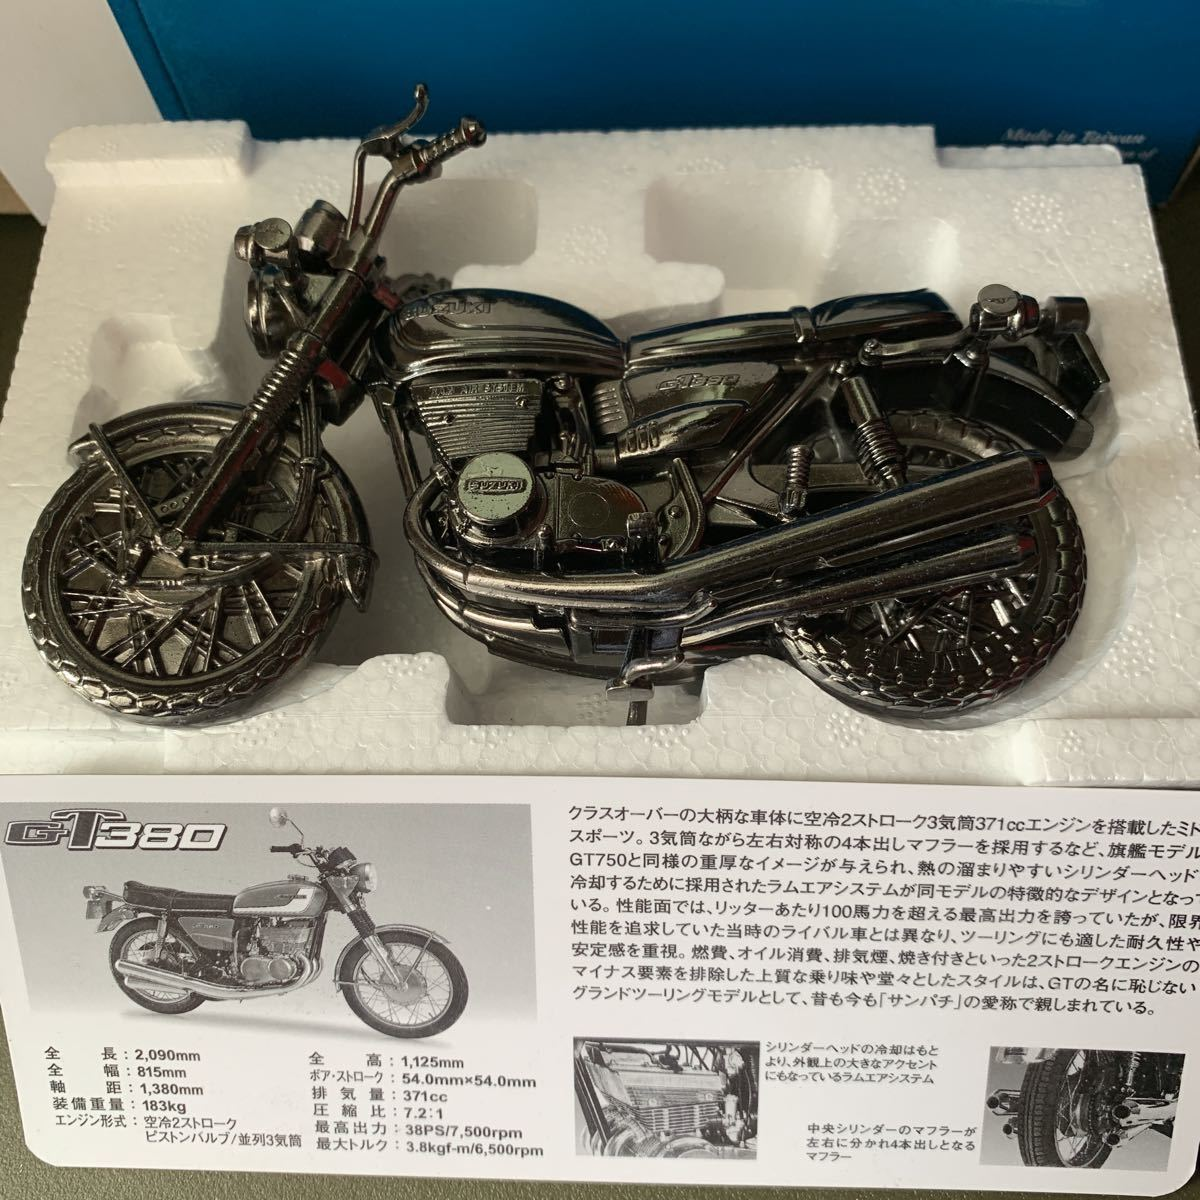 K_DSC0054 世界の名車シリーズ vol.37 SUZUKI GT380 レッドバロン ミニレプリカ バイクのインテリアミニカー_画像3